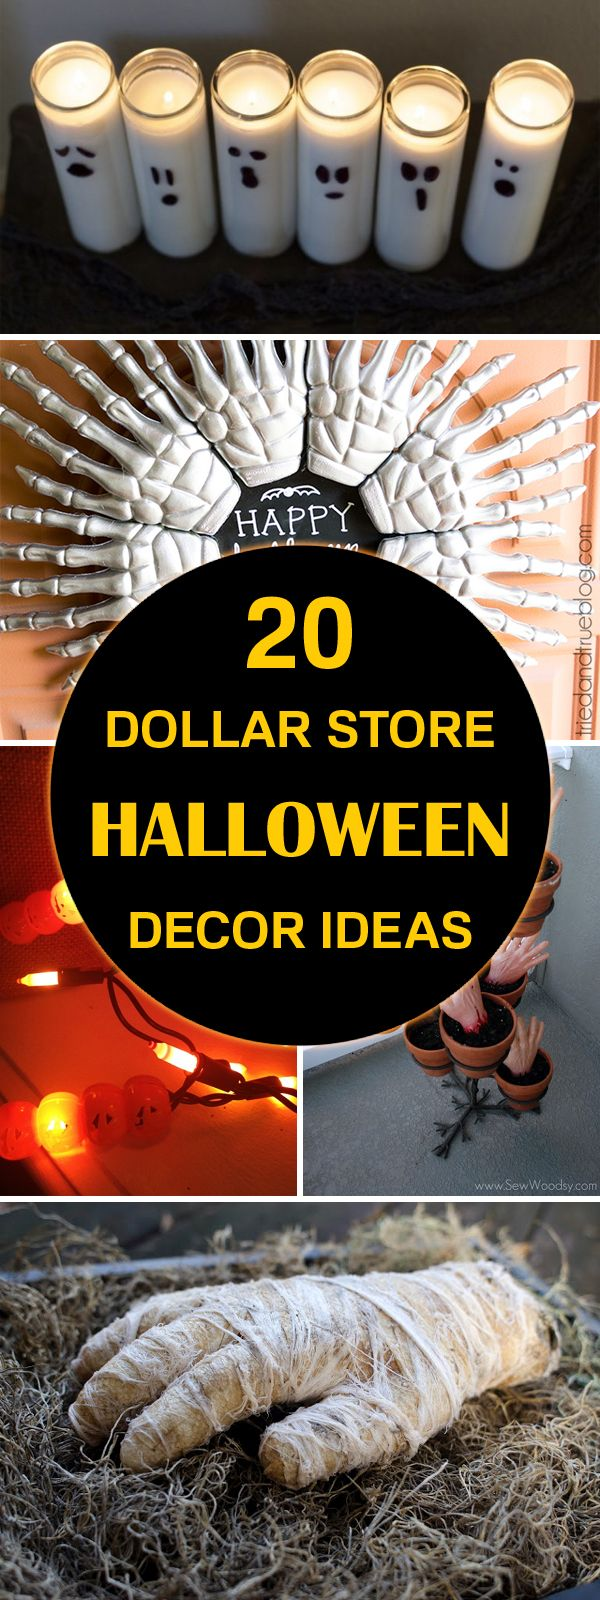 Diy halloween party decorations - 20 Dollar Store Halloween Decor Ideas